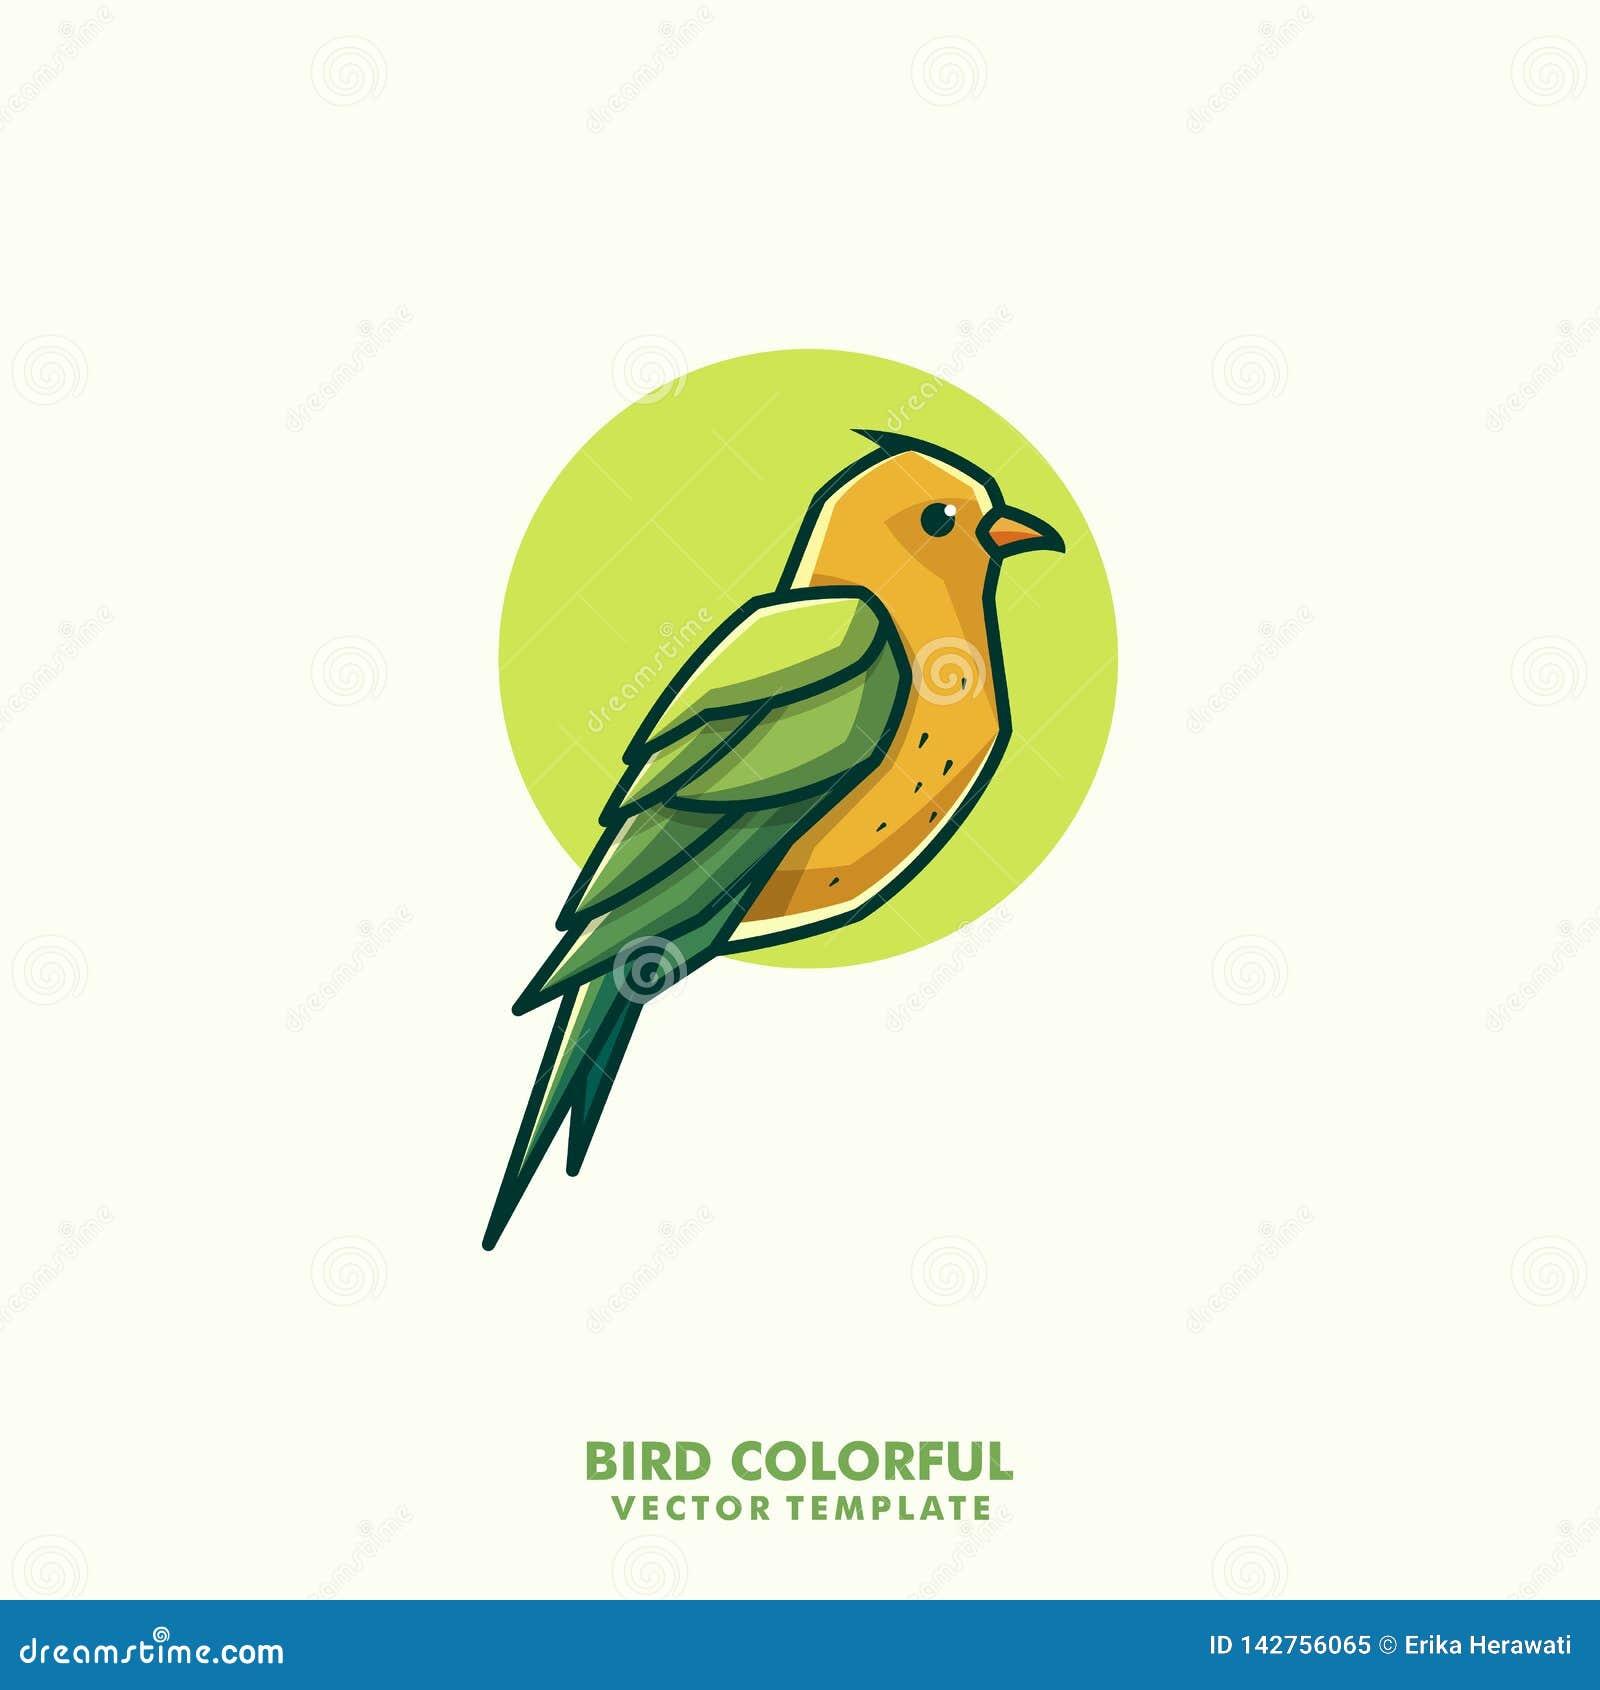 Bird Colorful Line art Concept illustration vector template